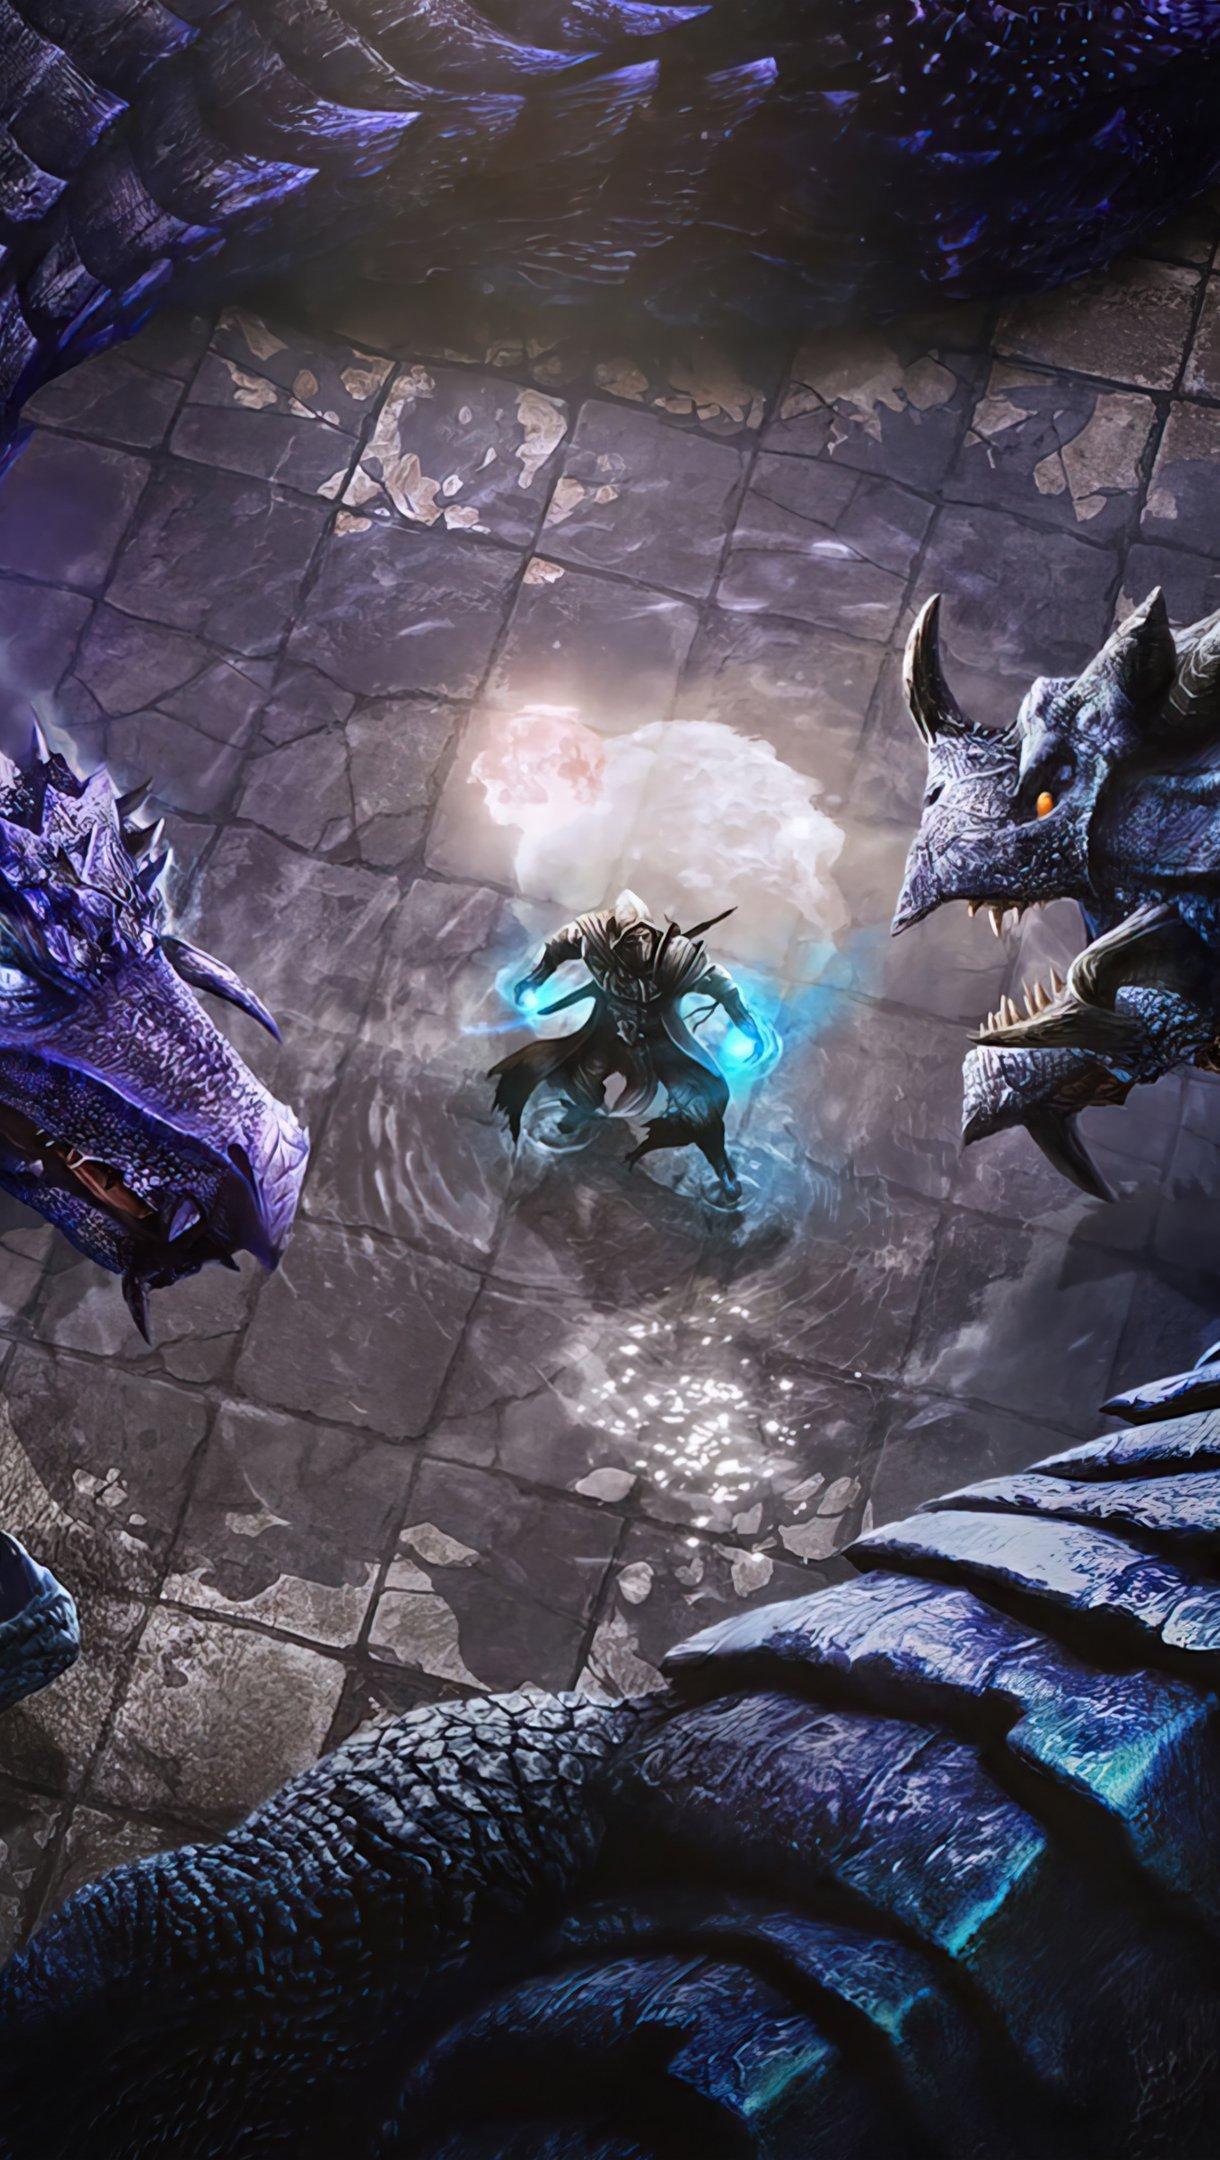 Fondos de pantalla Dragones de The Elder Scrolls Online Vertical